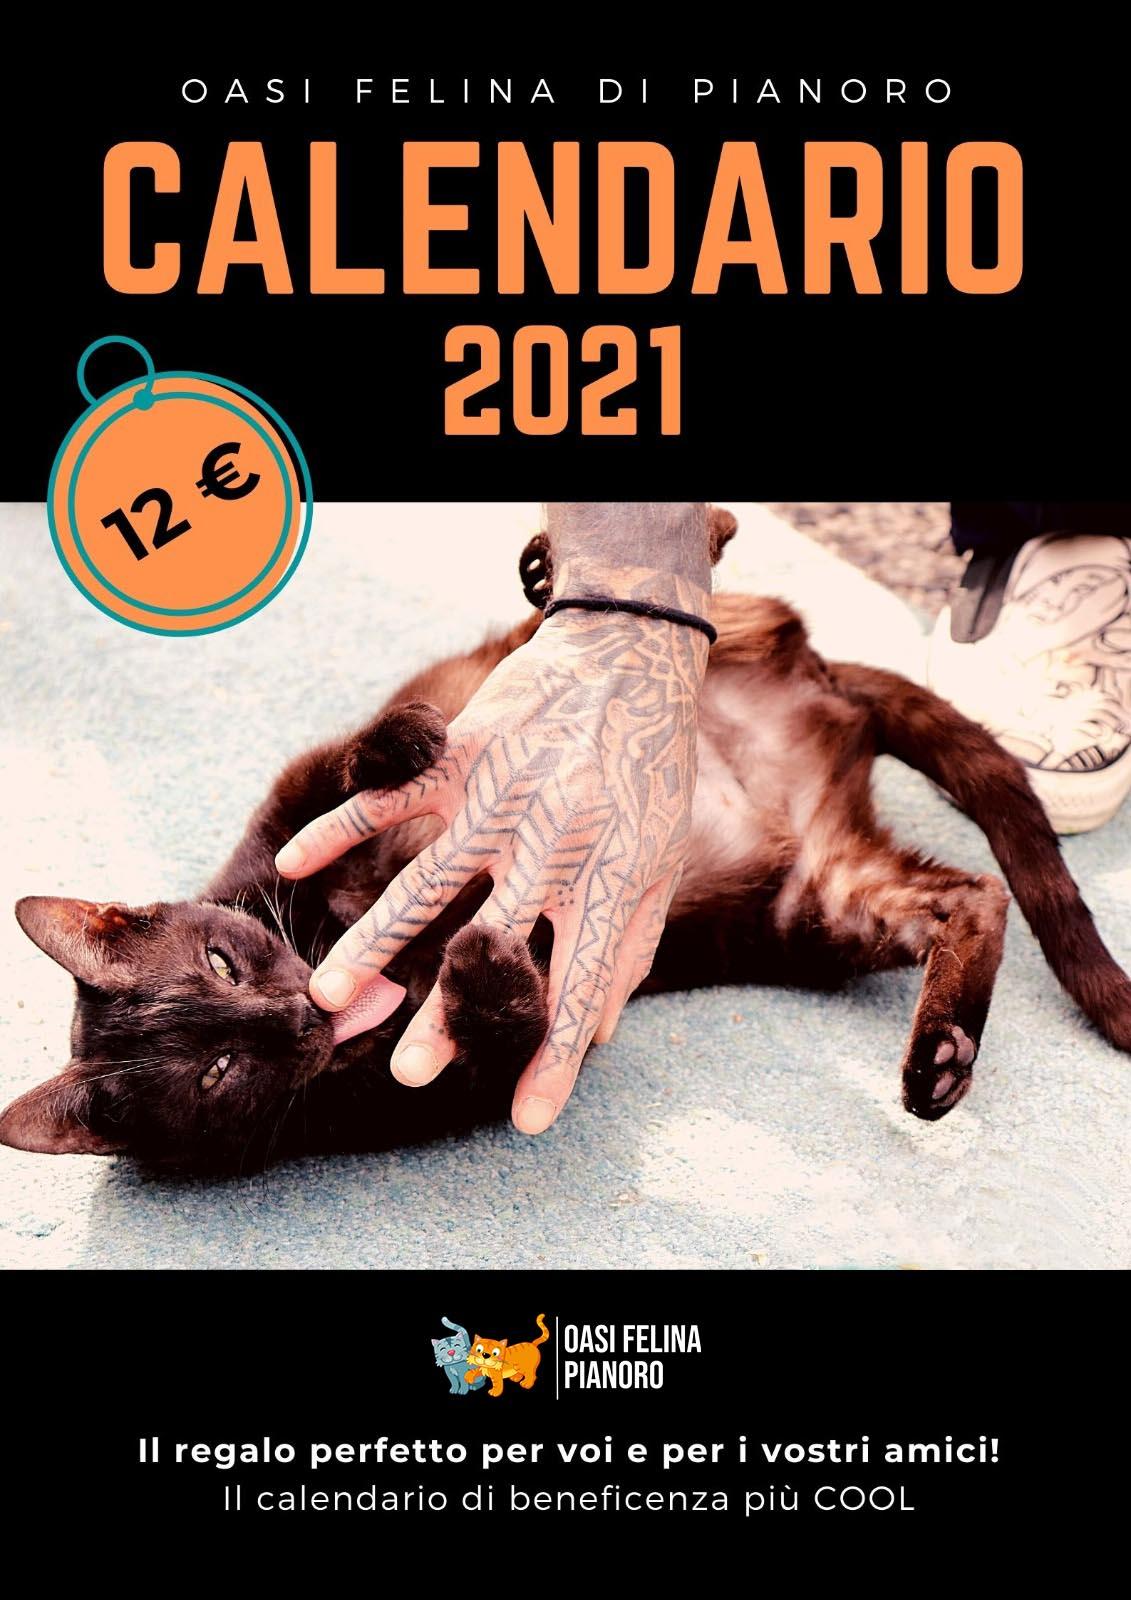 Calendario 2021 Oasi Felina   Una Zampa sul Cuore Onlus